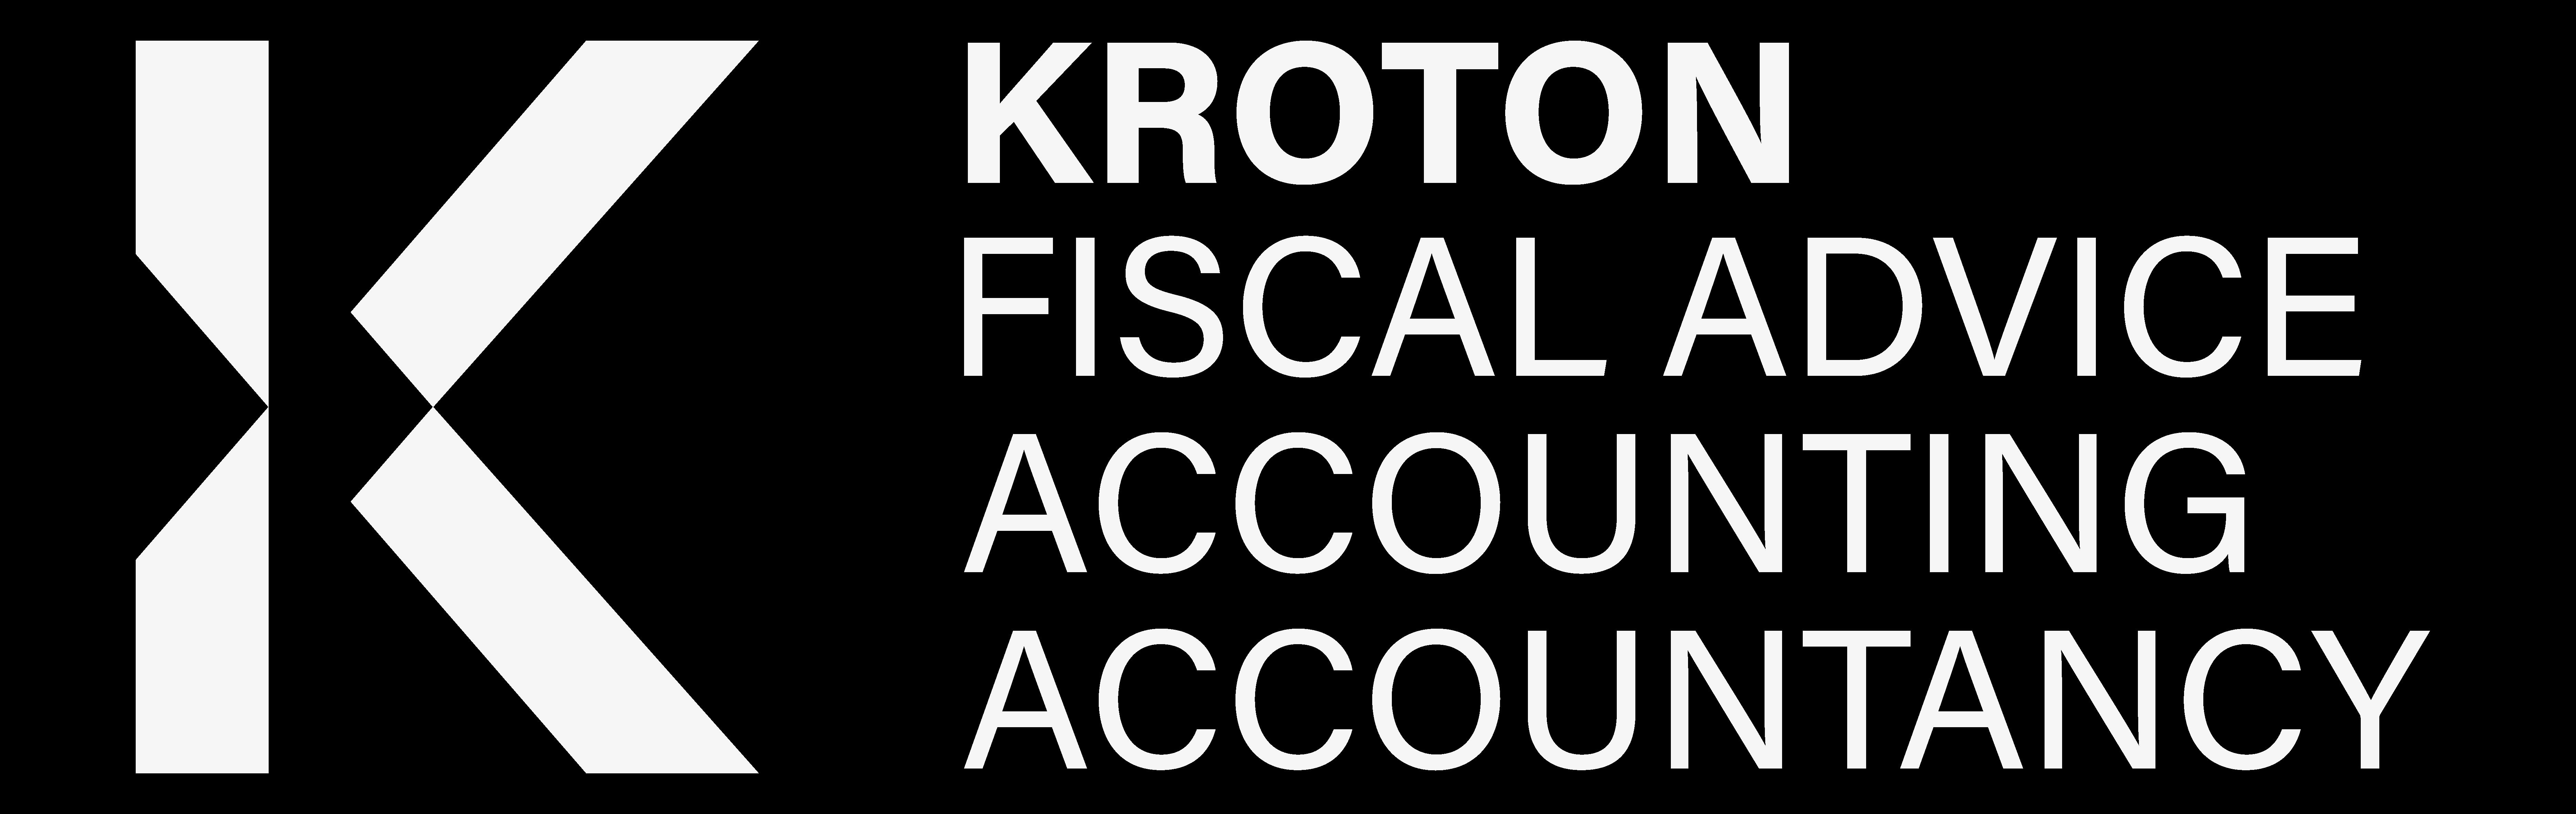 kroton fiscal advice accounting accountancy